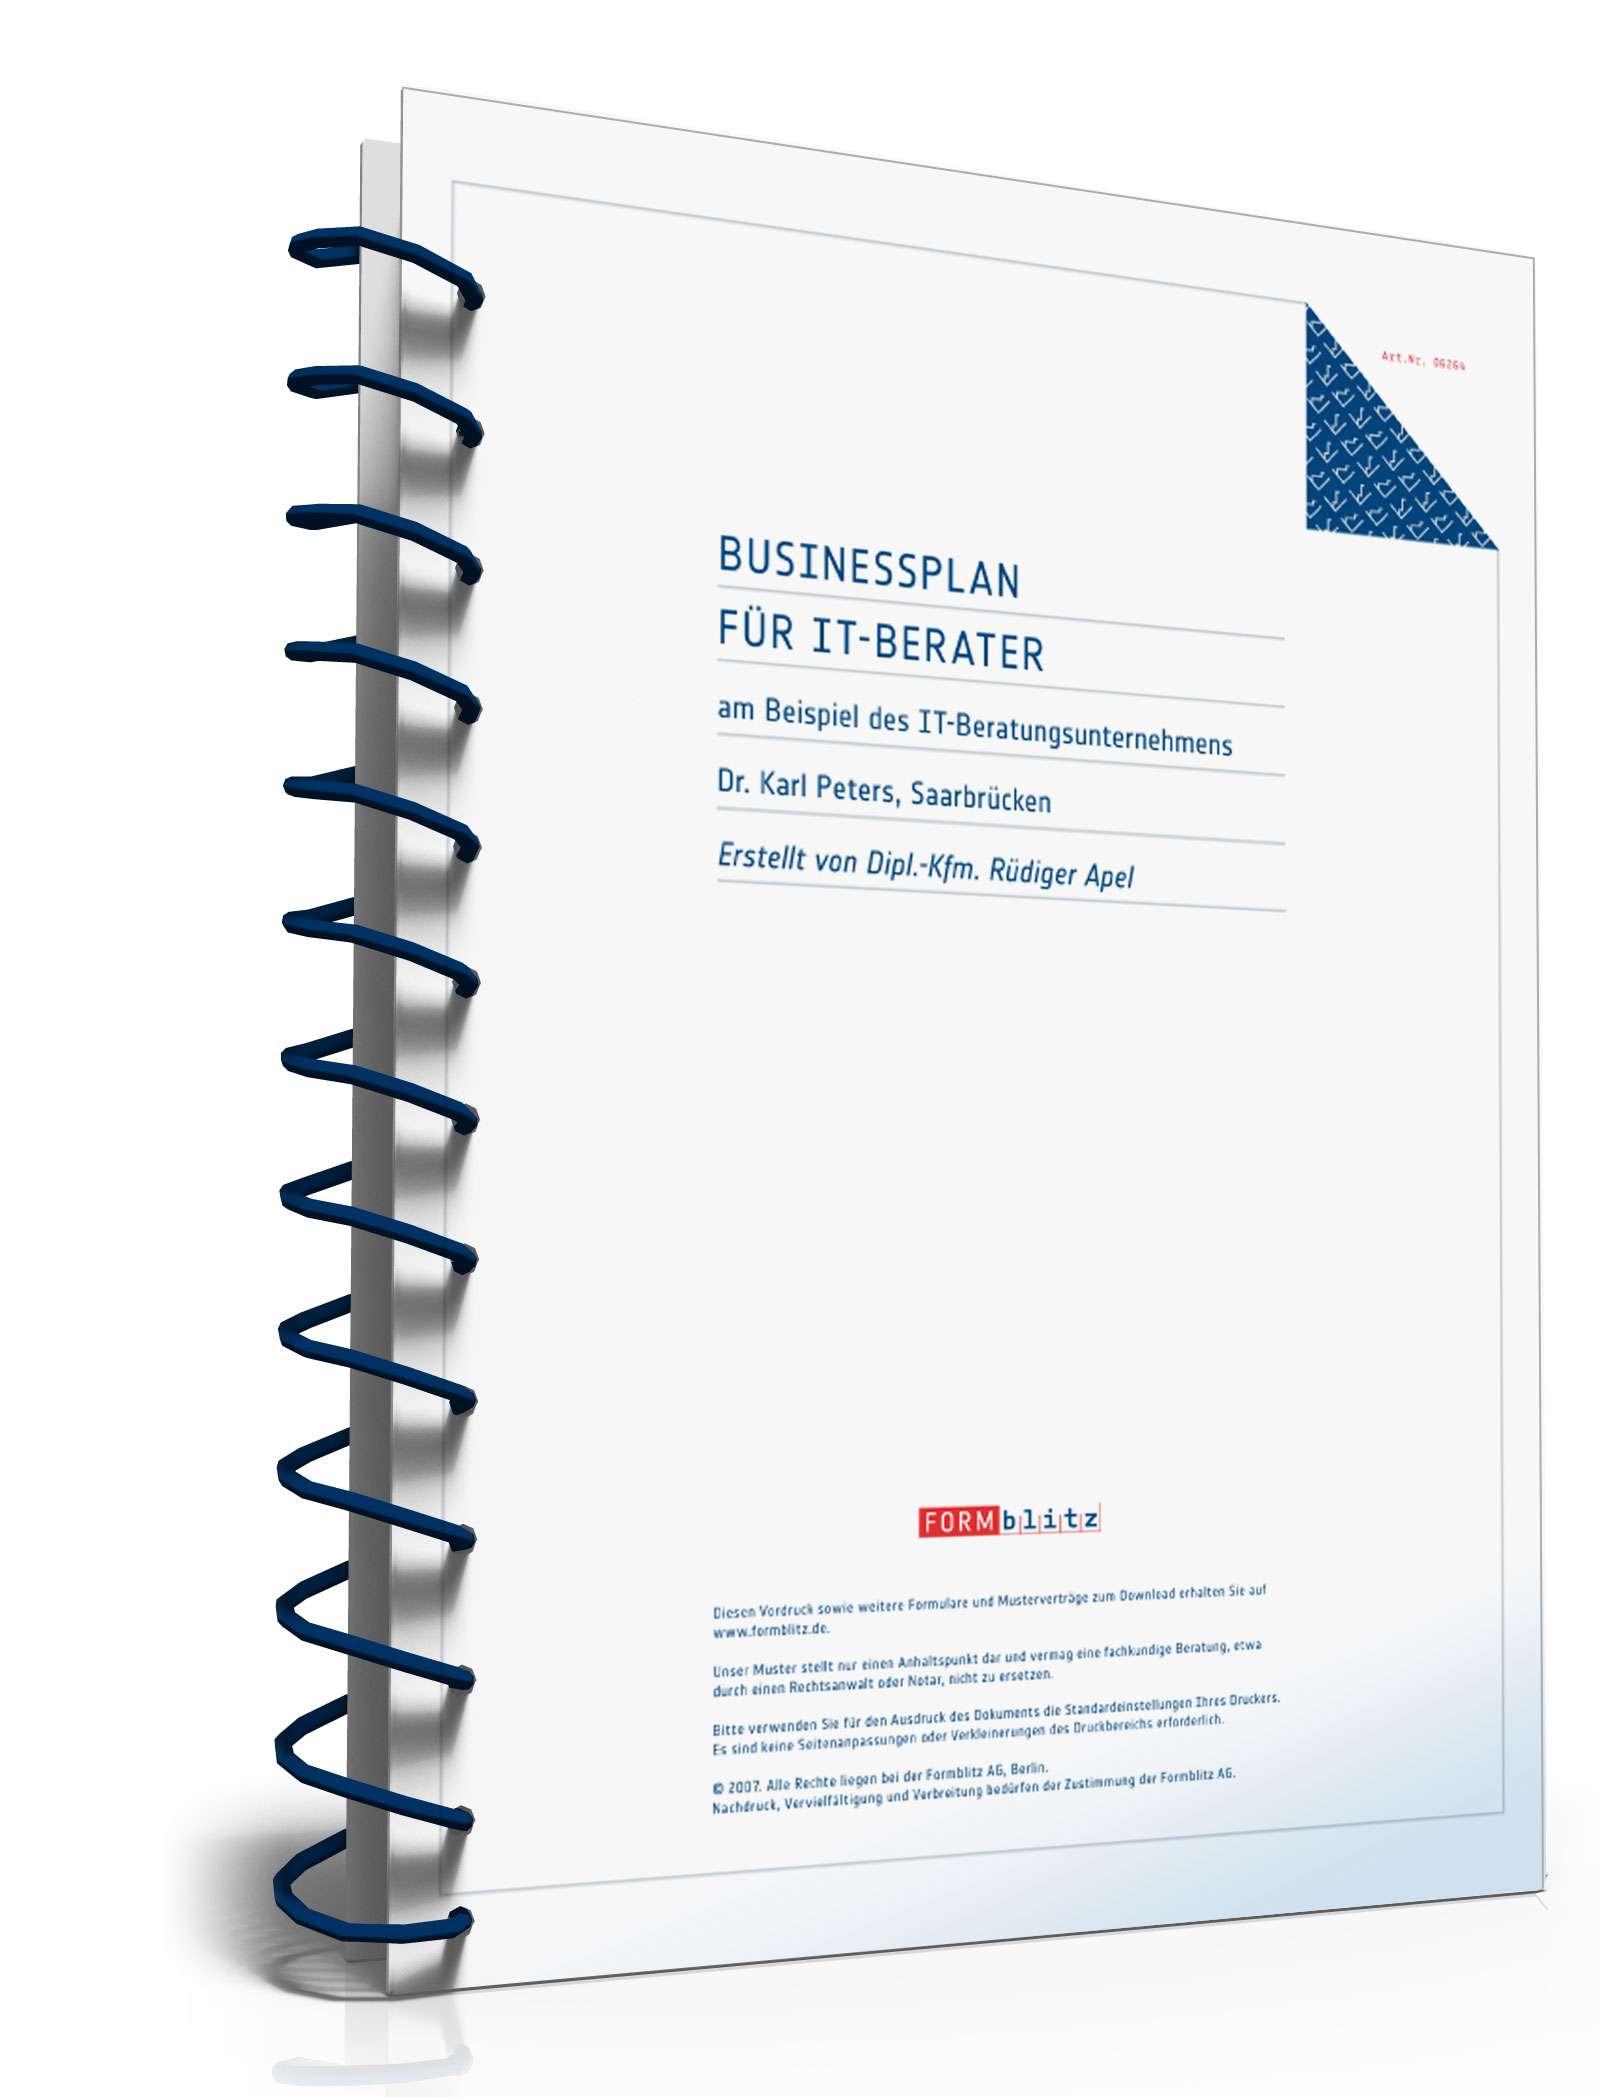 Businessplan IT-Berater | Muster zum Download